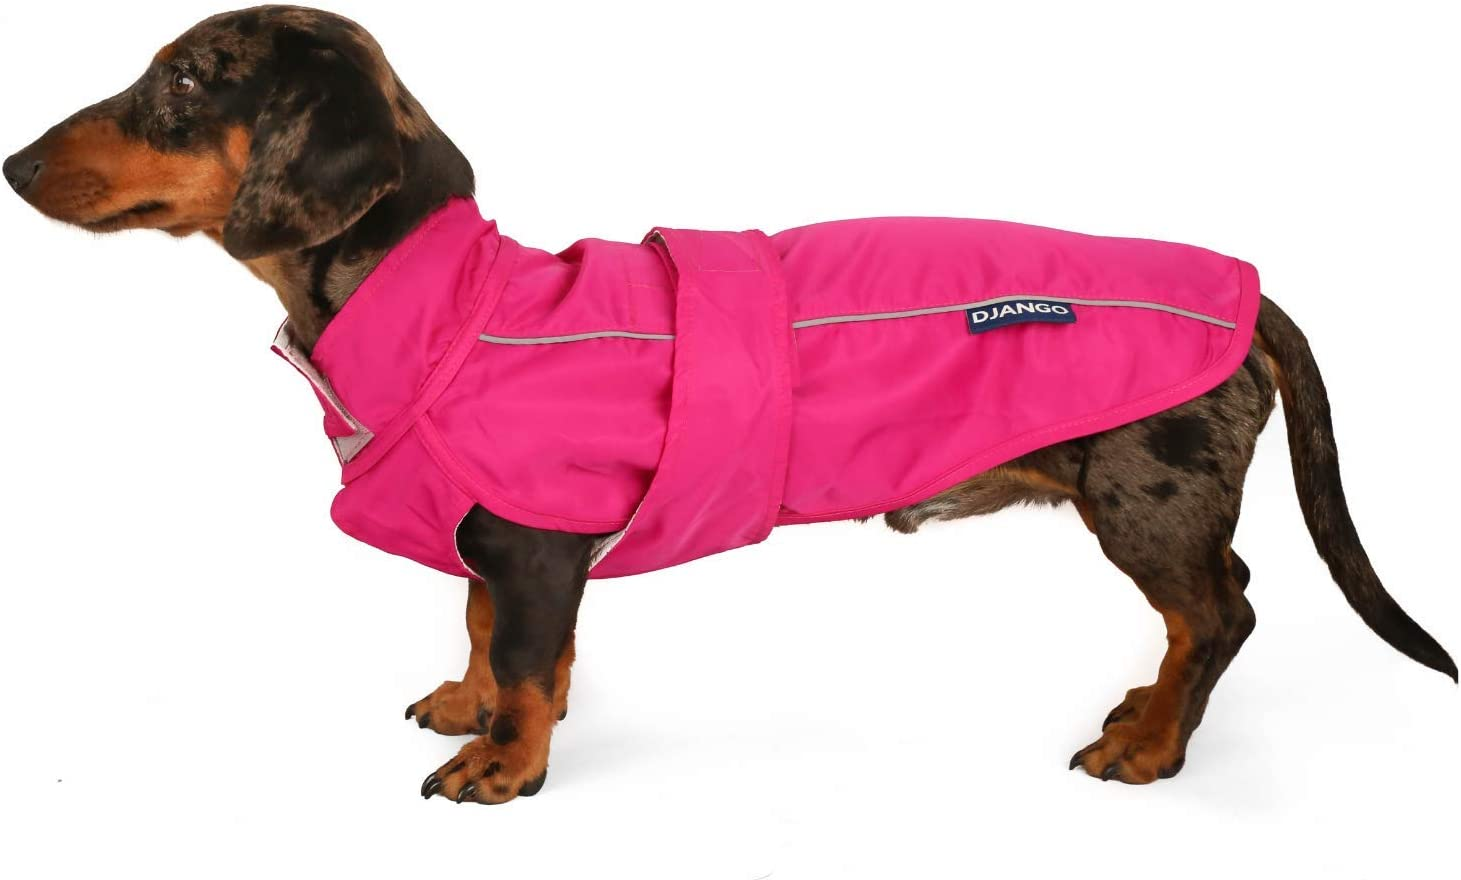 Max 48% OFF Super intense SALE DJANGO City Slicker All-Weather Jacket Water-Repellent Rai Dog